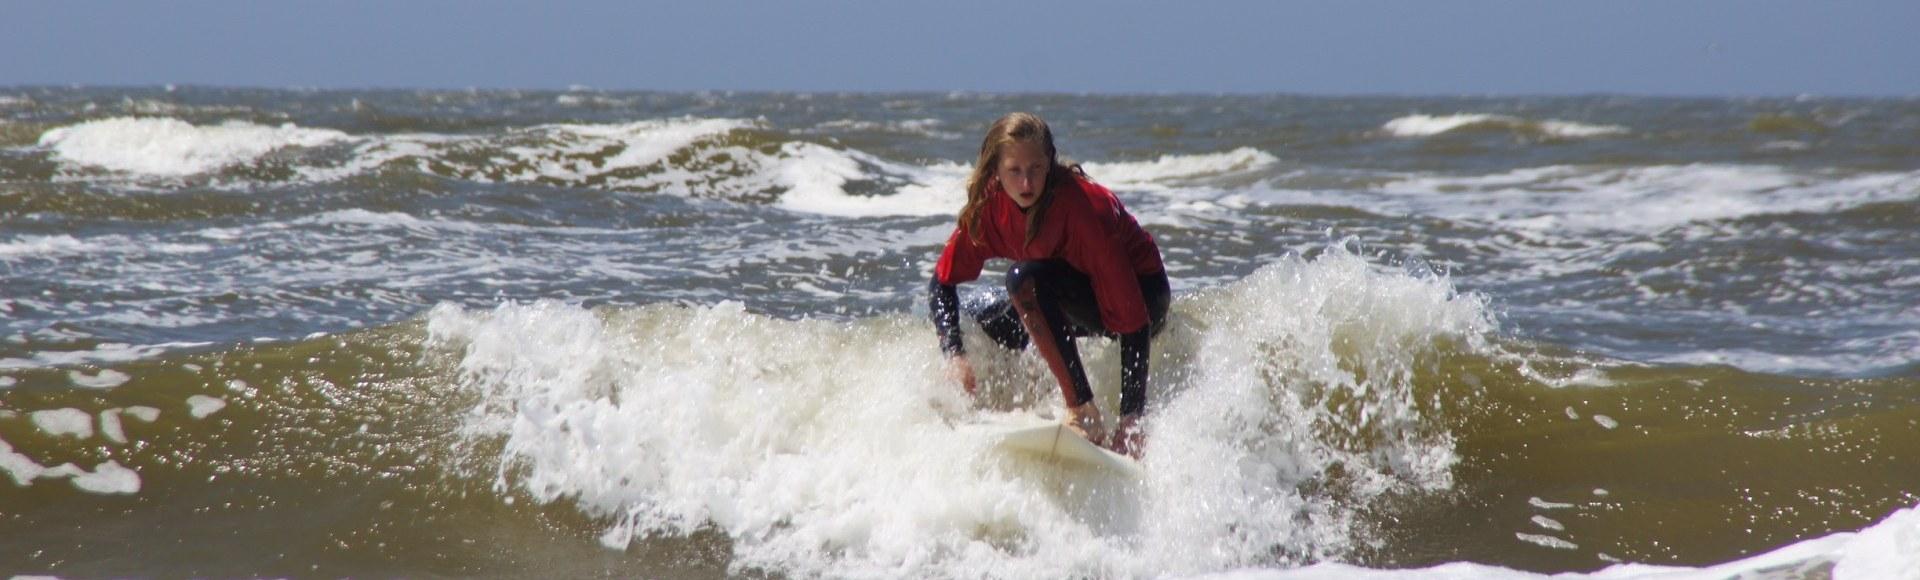 Surf Les Bloemendaal